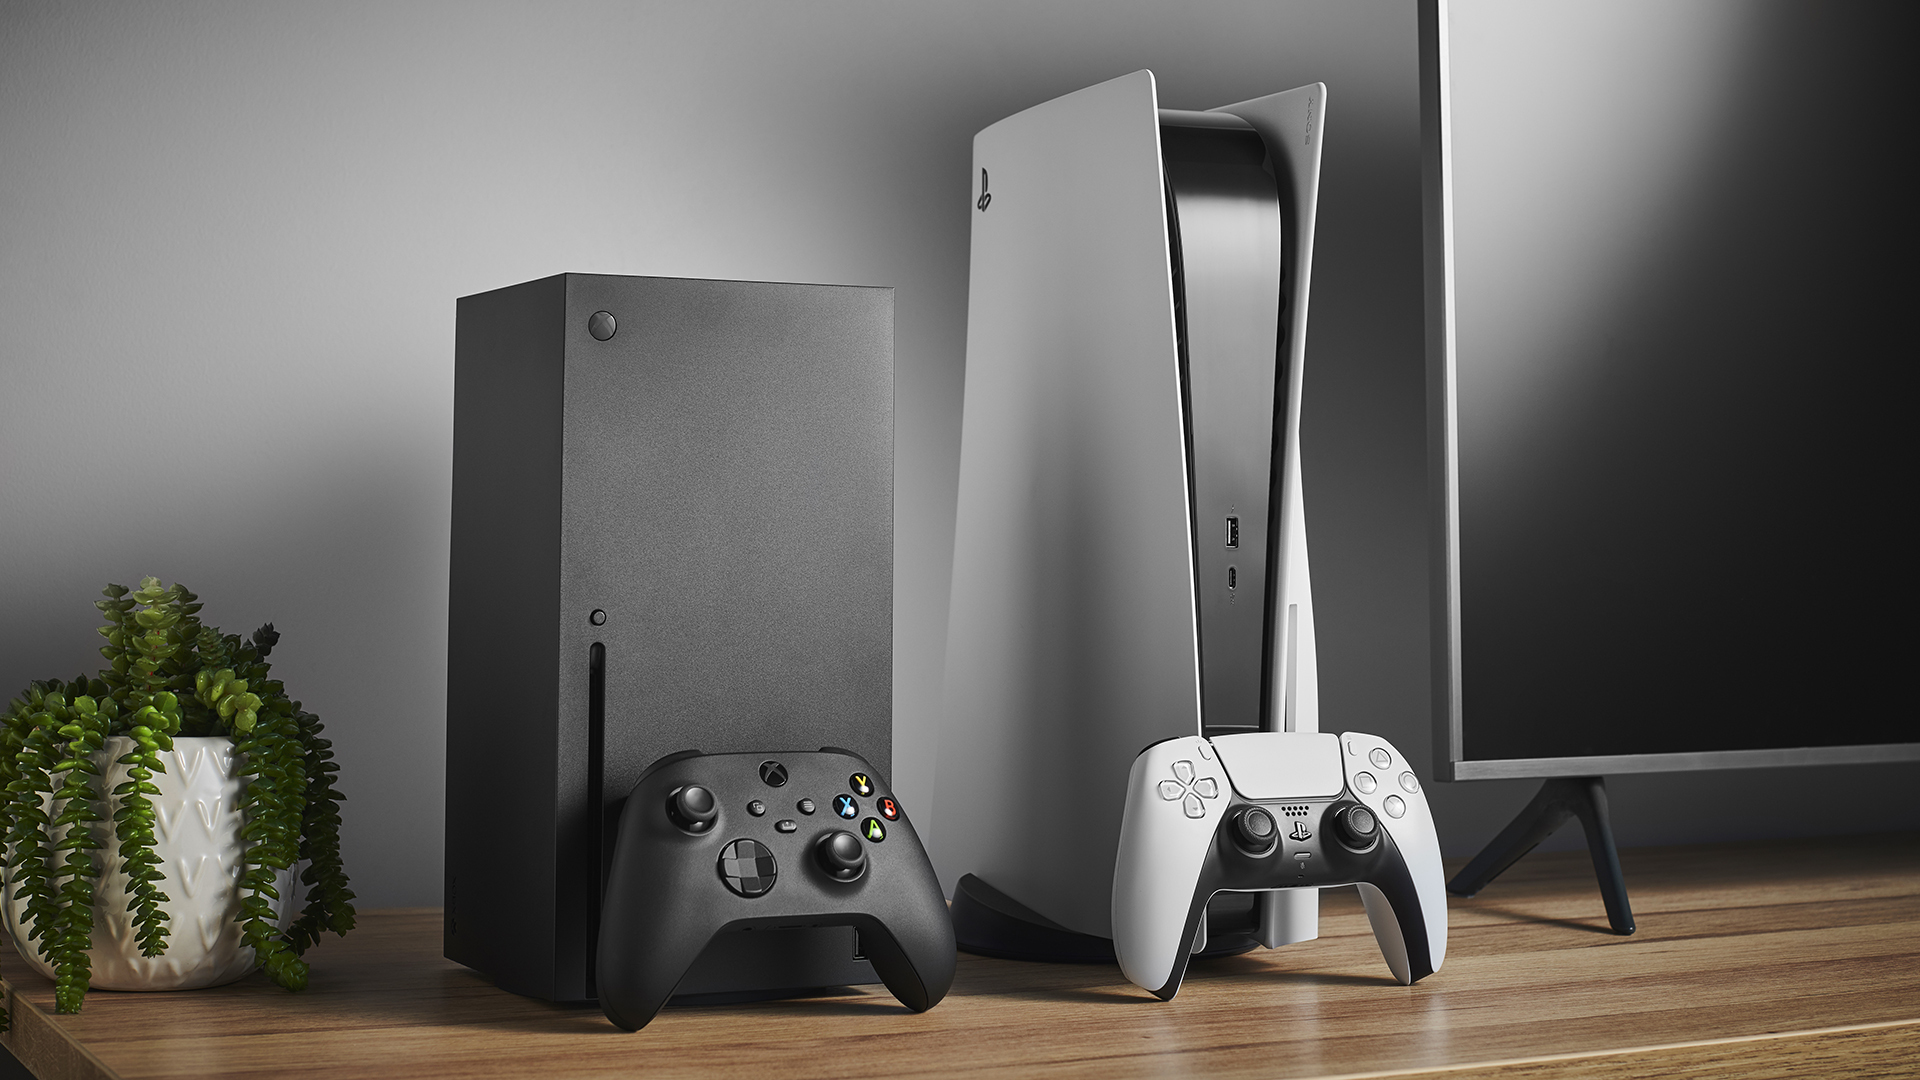 Microsoft ответила на подорожание PlayStation 5 в России сохранением цен на Xbox Series